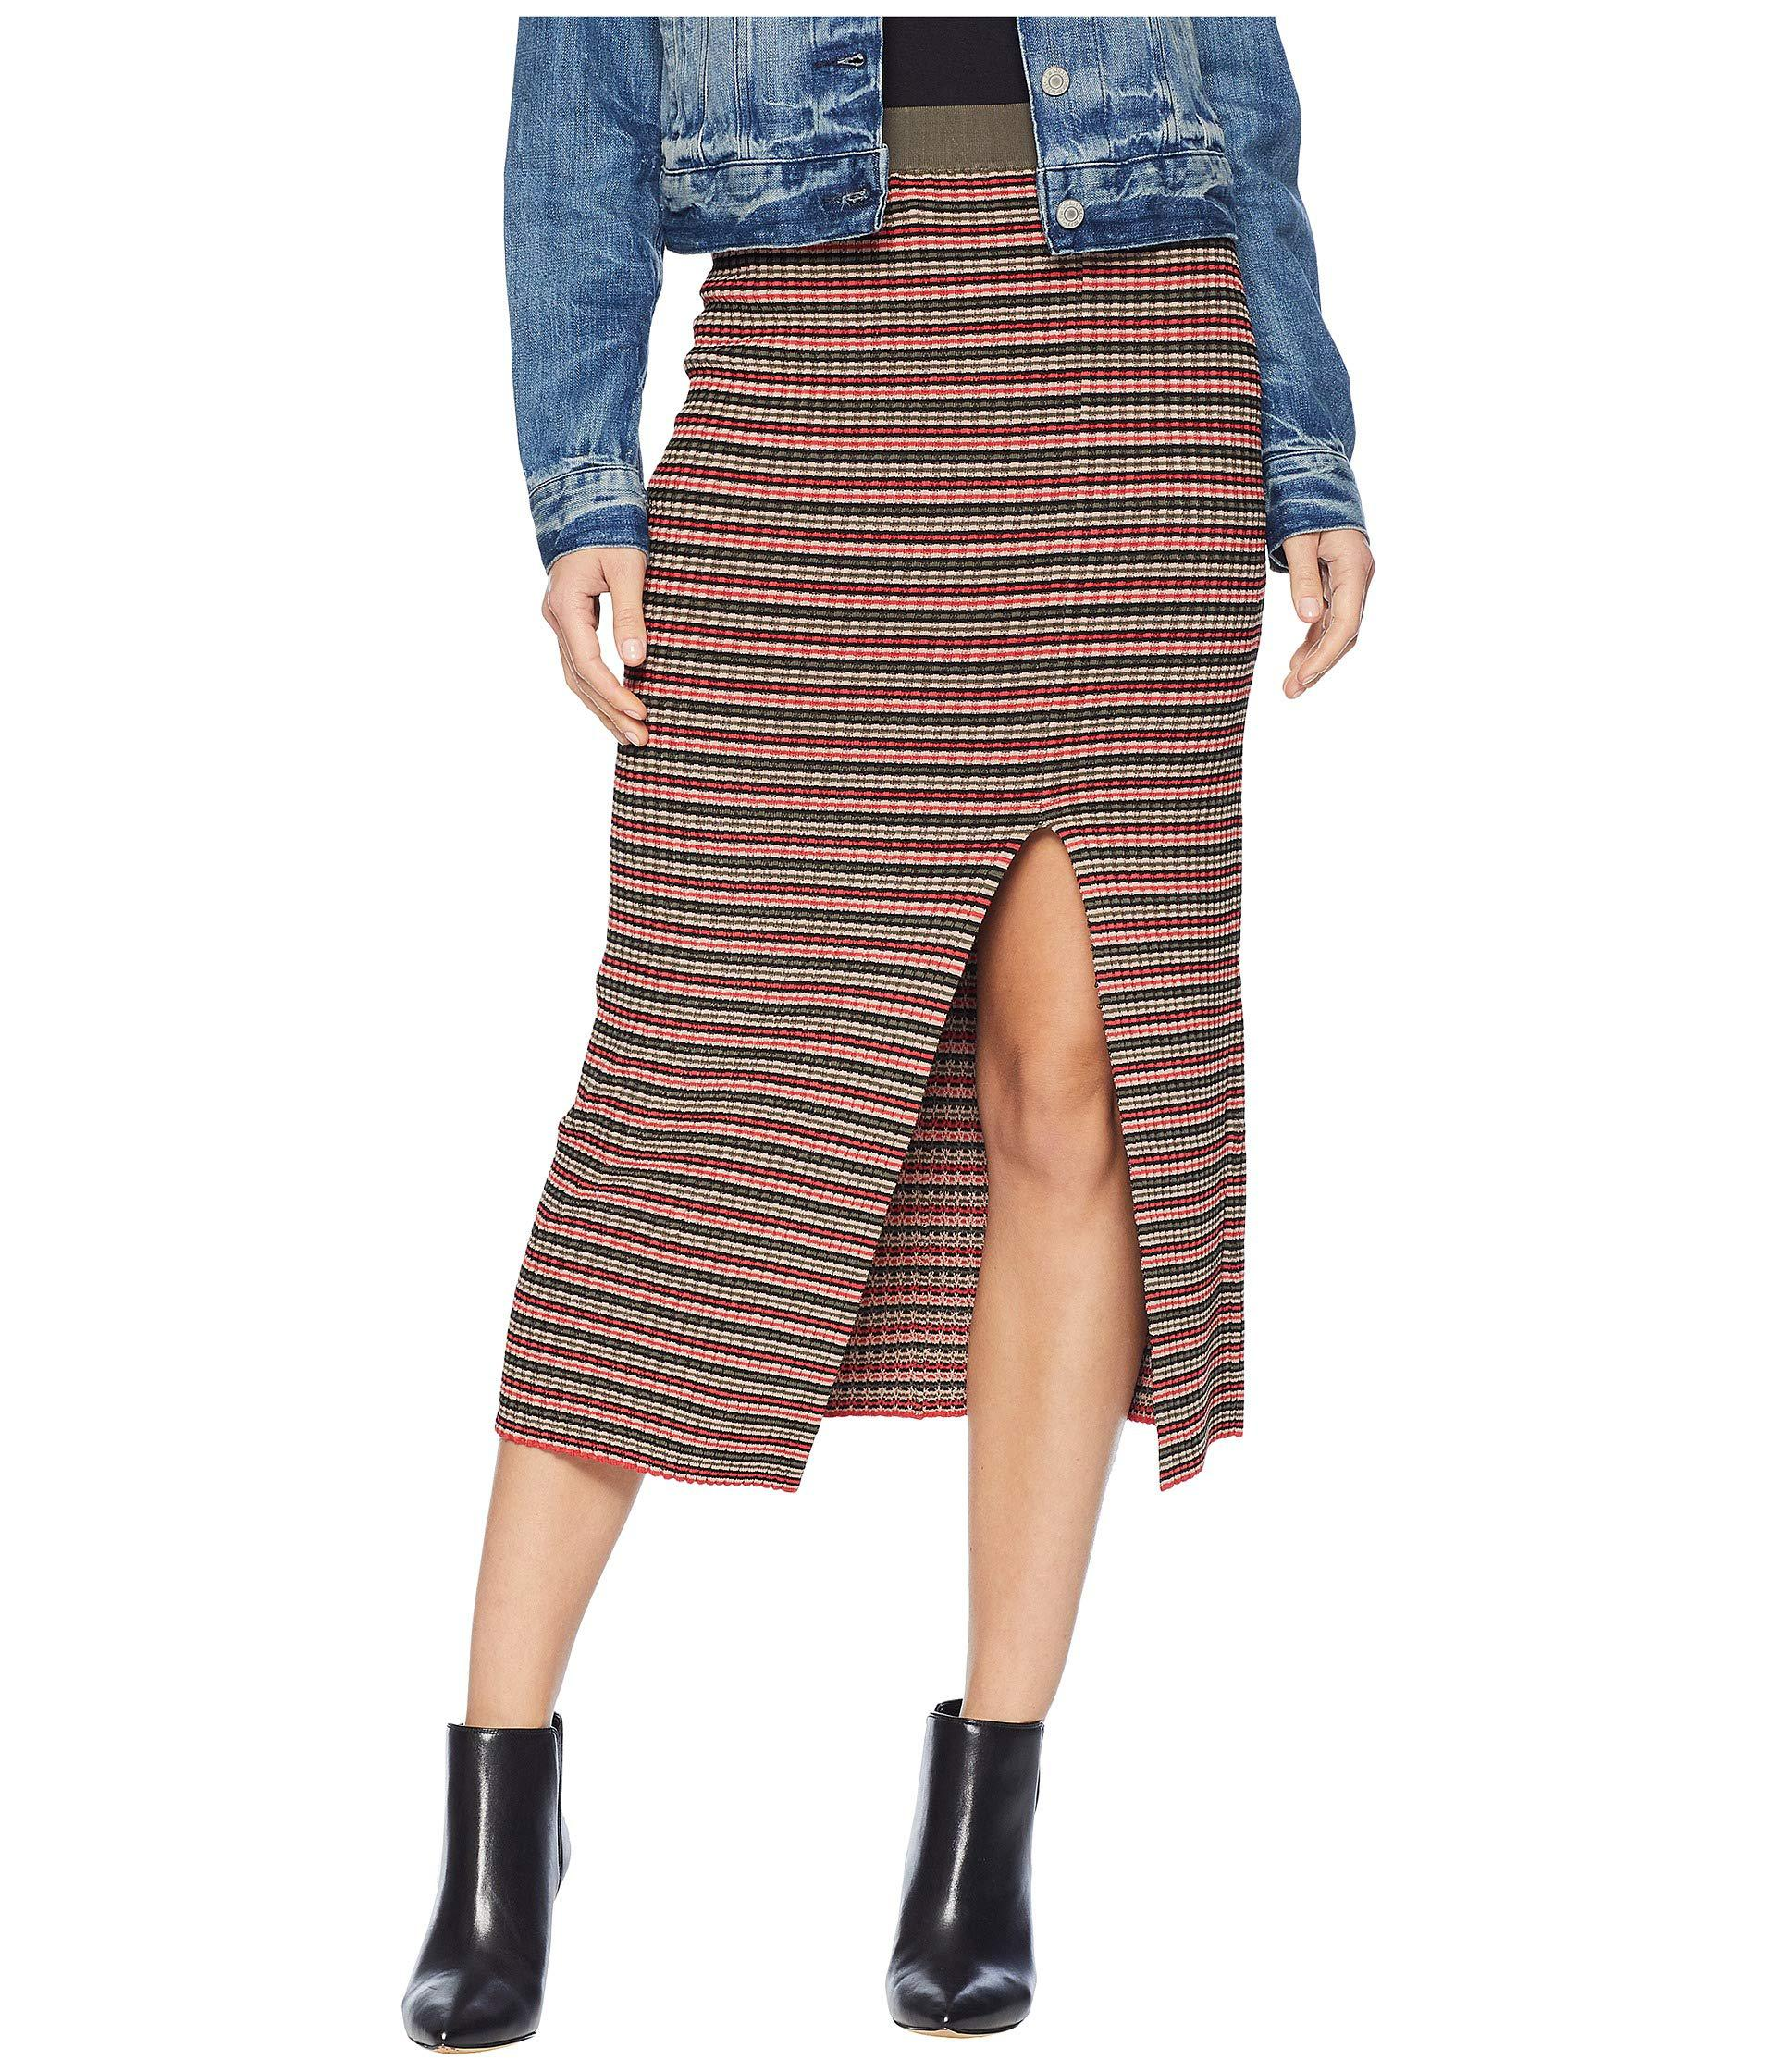 bb0102fdab Lyst - BCBGMAXAZRIA Multicolor Stripe Rib High-waist Pencil Skirt in ...